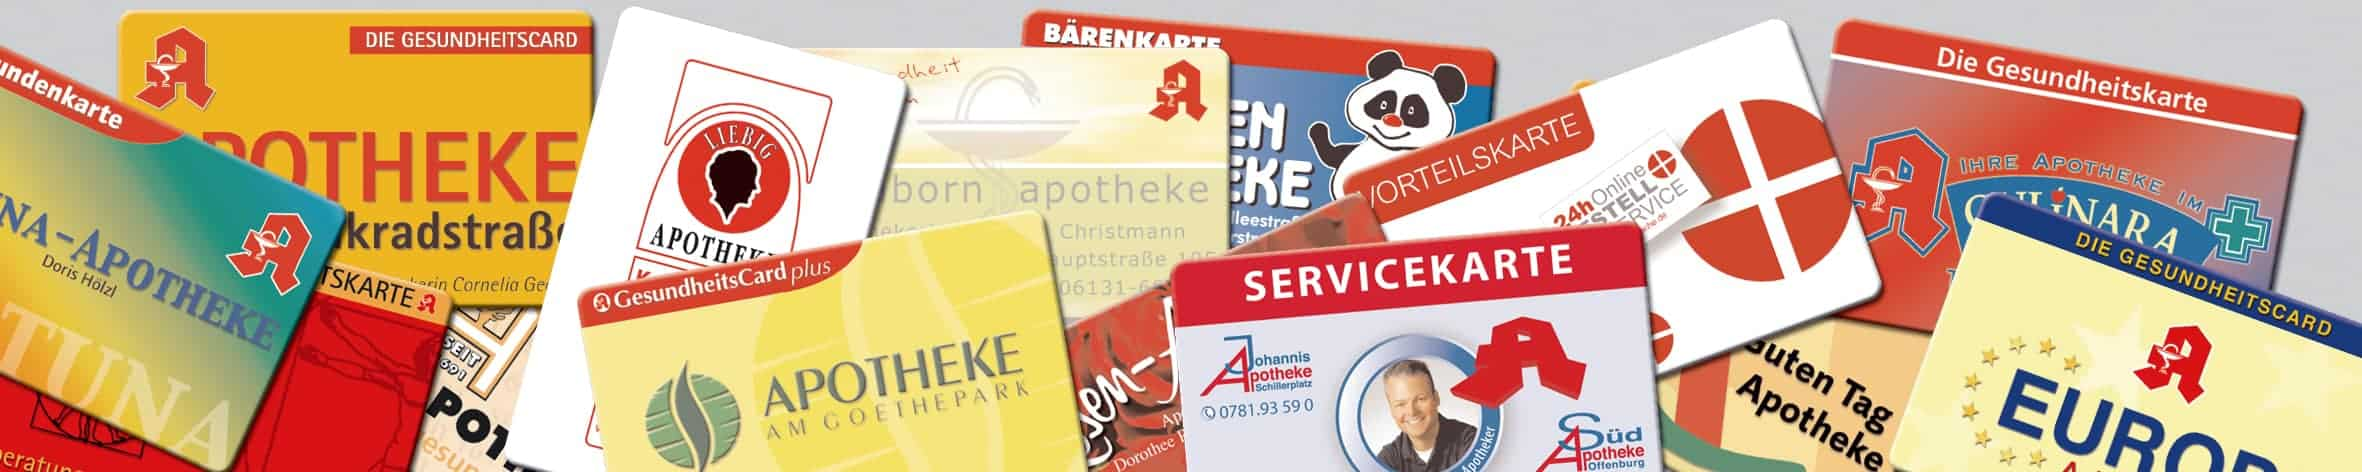 Apotheken-Kundenkarten